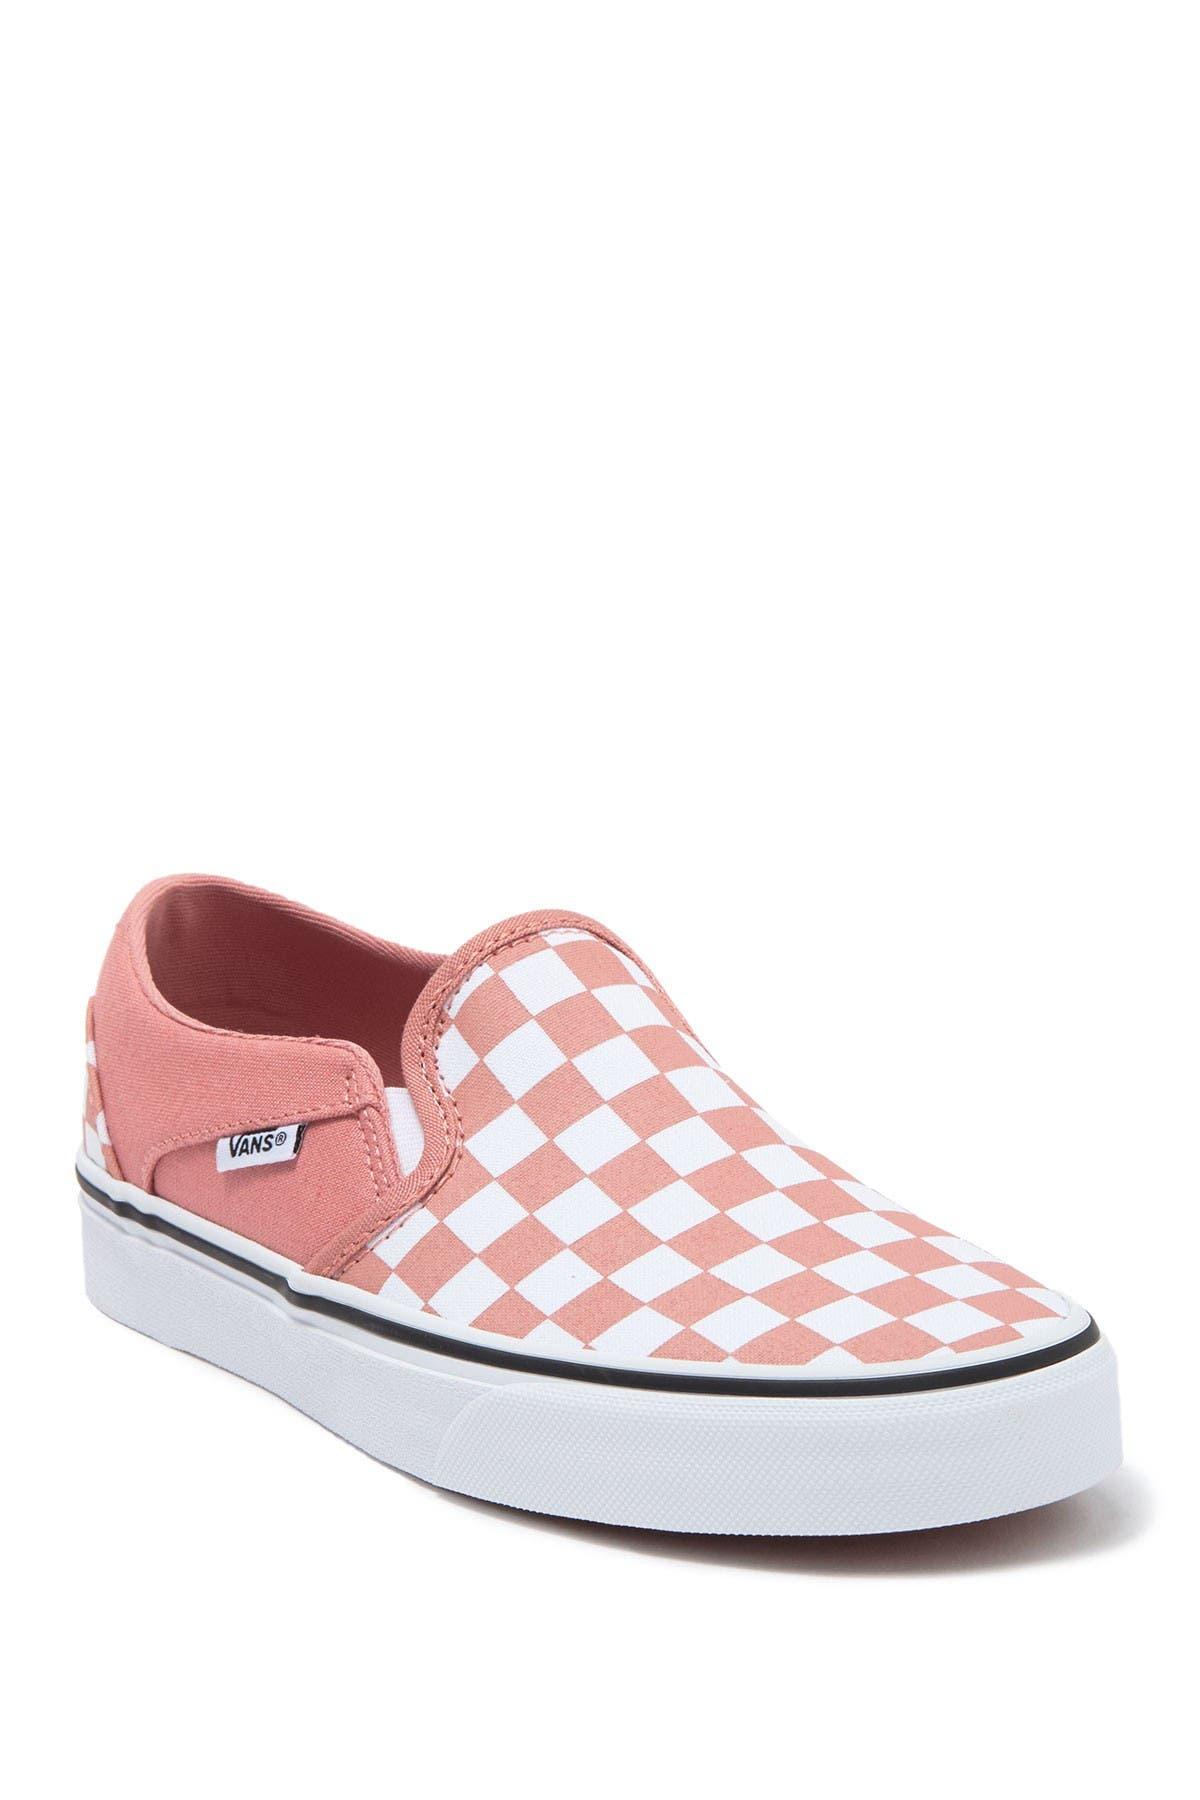 Image of VANS Asher Slip-On Checkerboard Sneaker